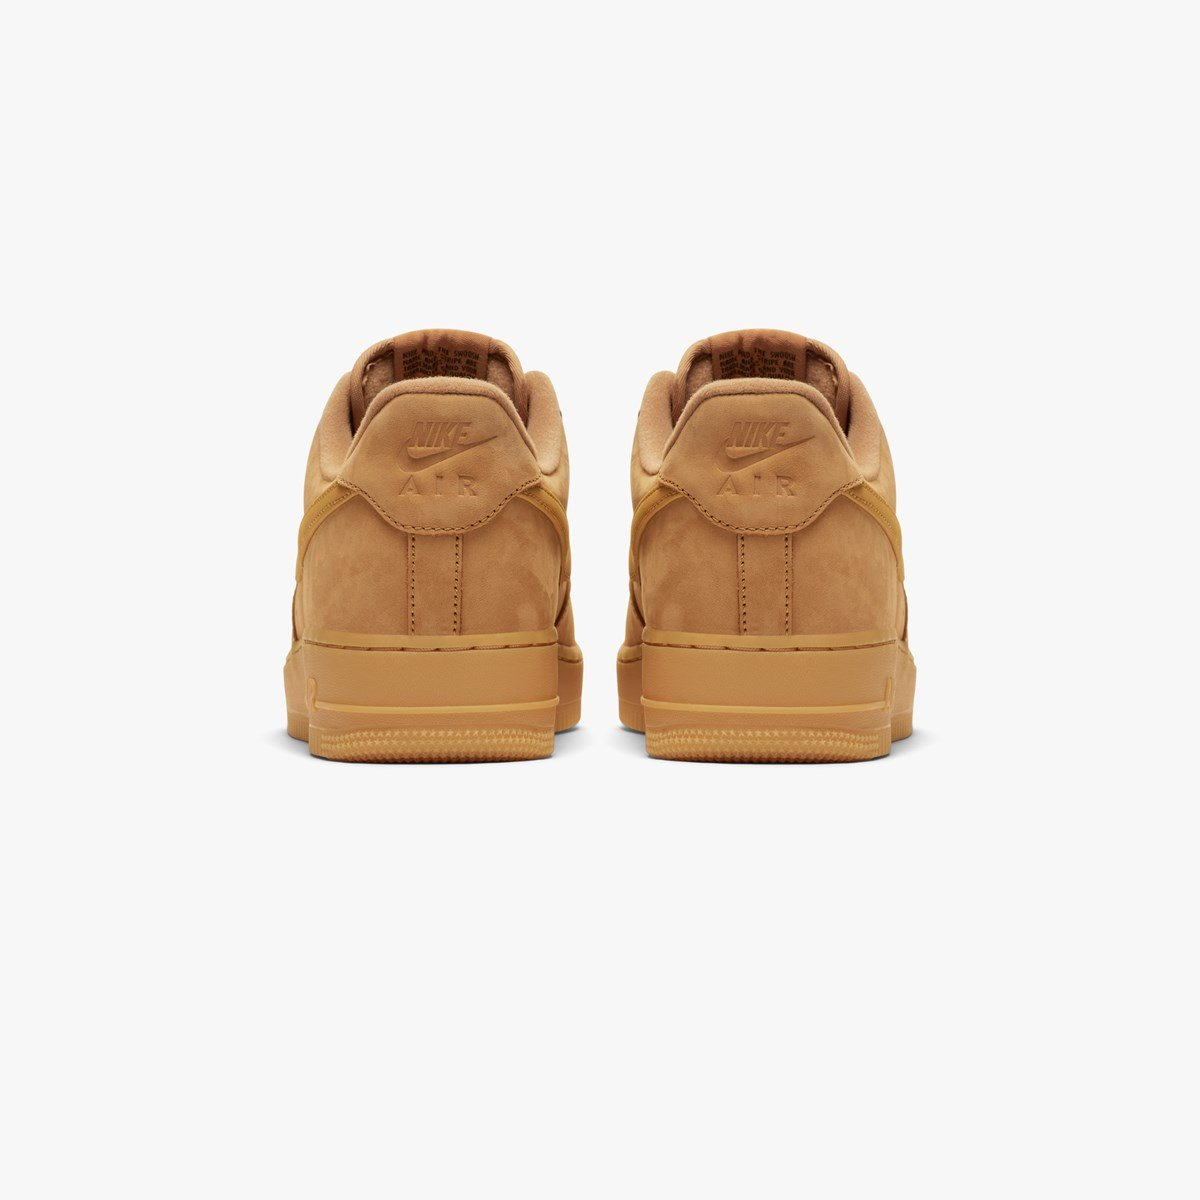 Nike Air Force 1 '07 WB - Cj9179-200 - SNS | sneakers & streetwear online since 1999